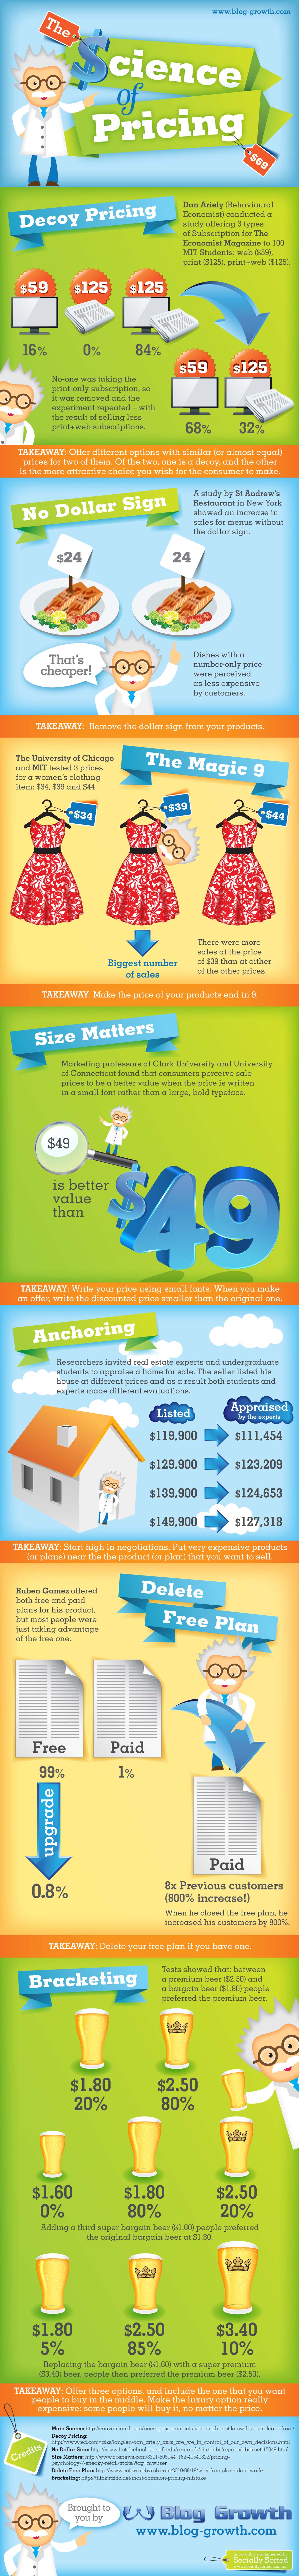 7 Pricing Tricks-Infographic